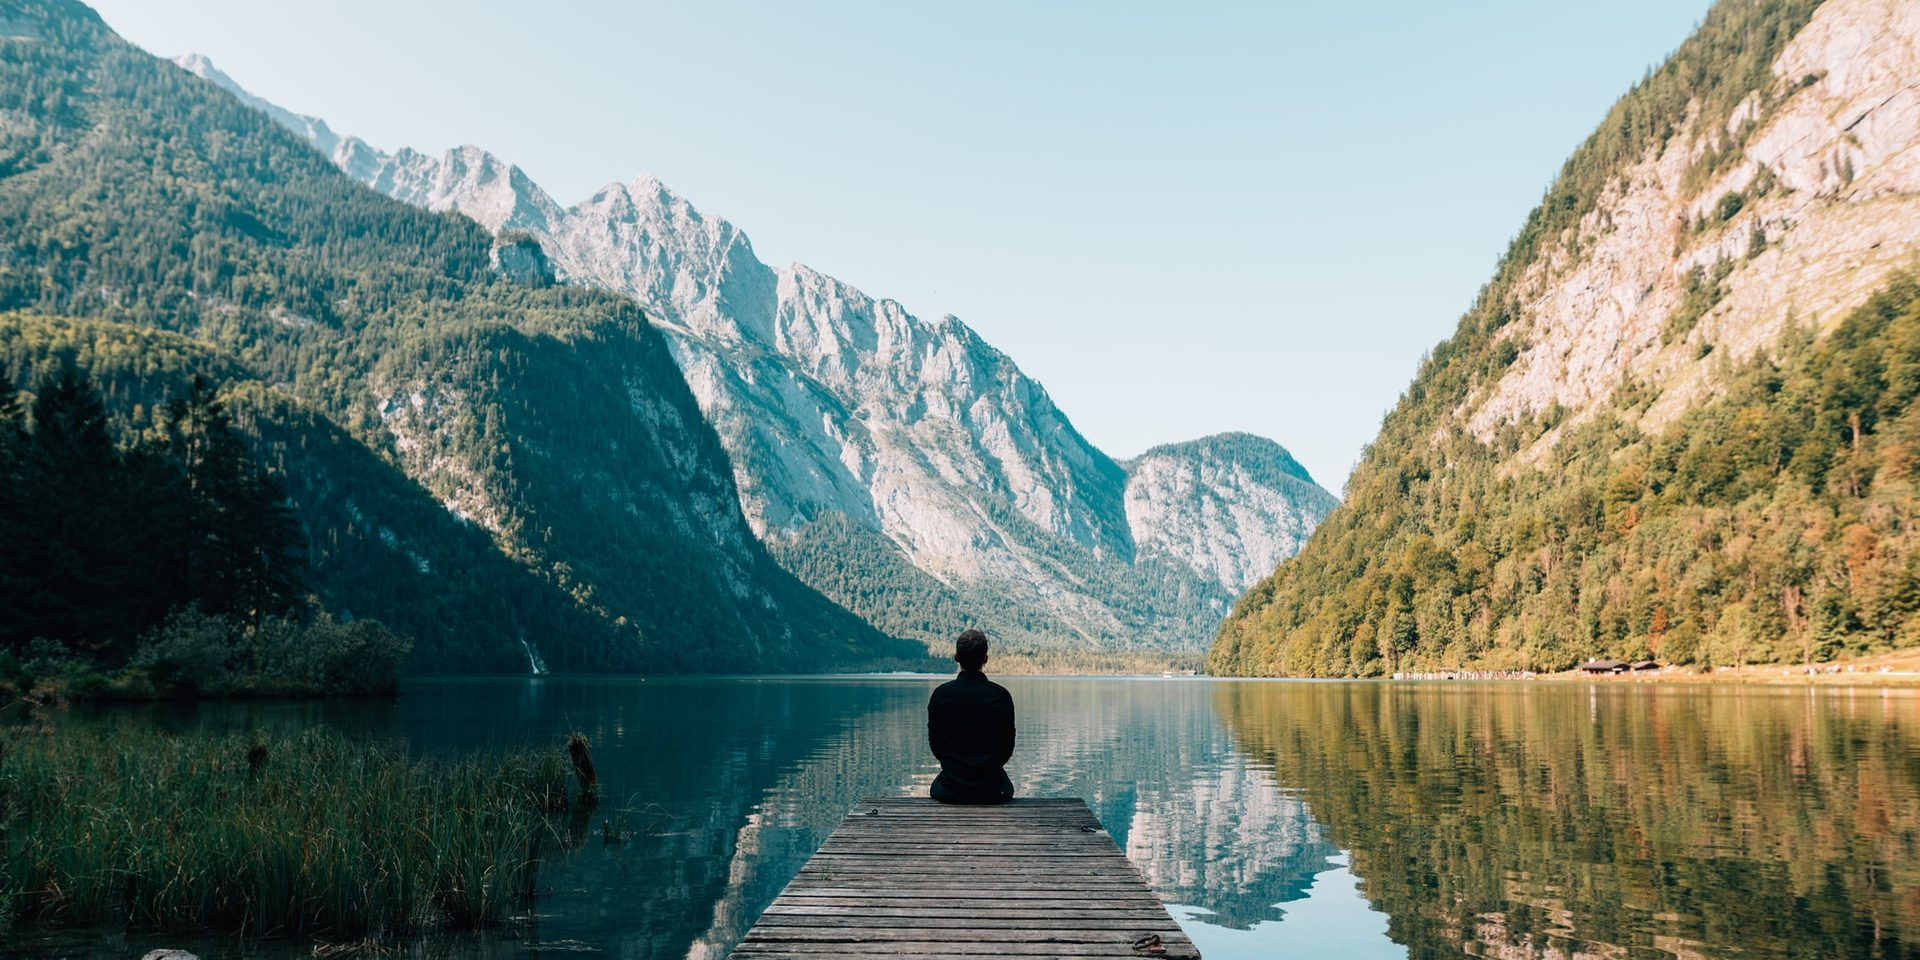 Man sitting at Königssee lake, Schönau am Königssee, Germany